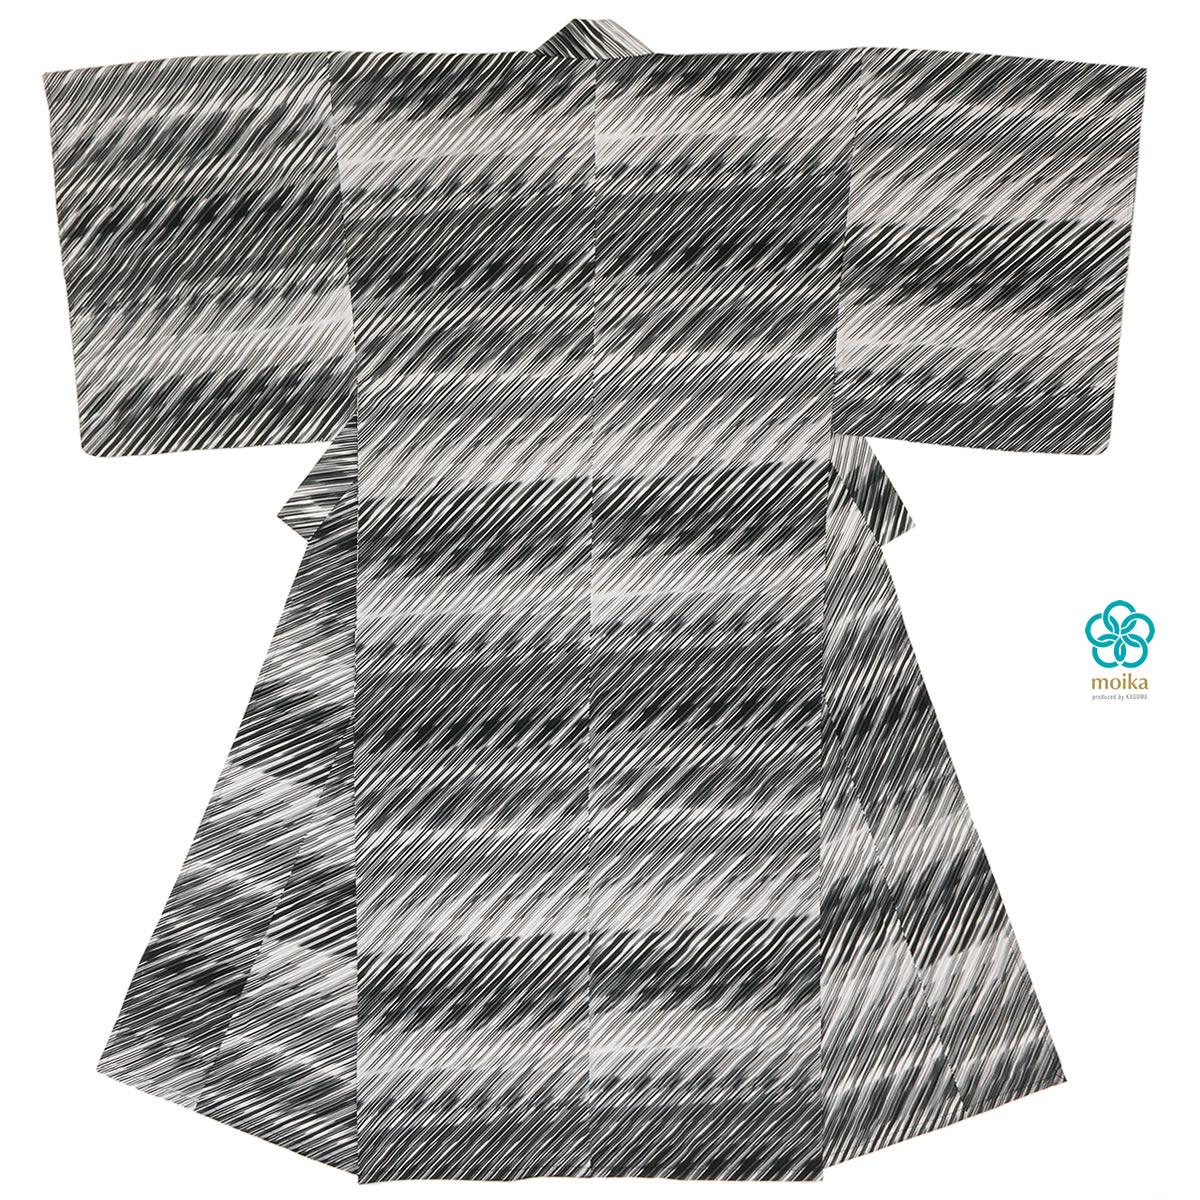 moika 浴衣 メンズ 単品 Mサイズ Lサイズ レトロ 大人 黒白 ブラック/ホワイト 雨 ストライプ 男性用 仕立て上がり